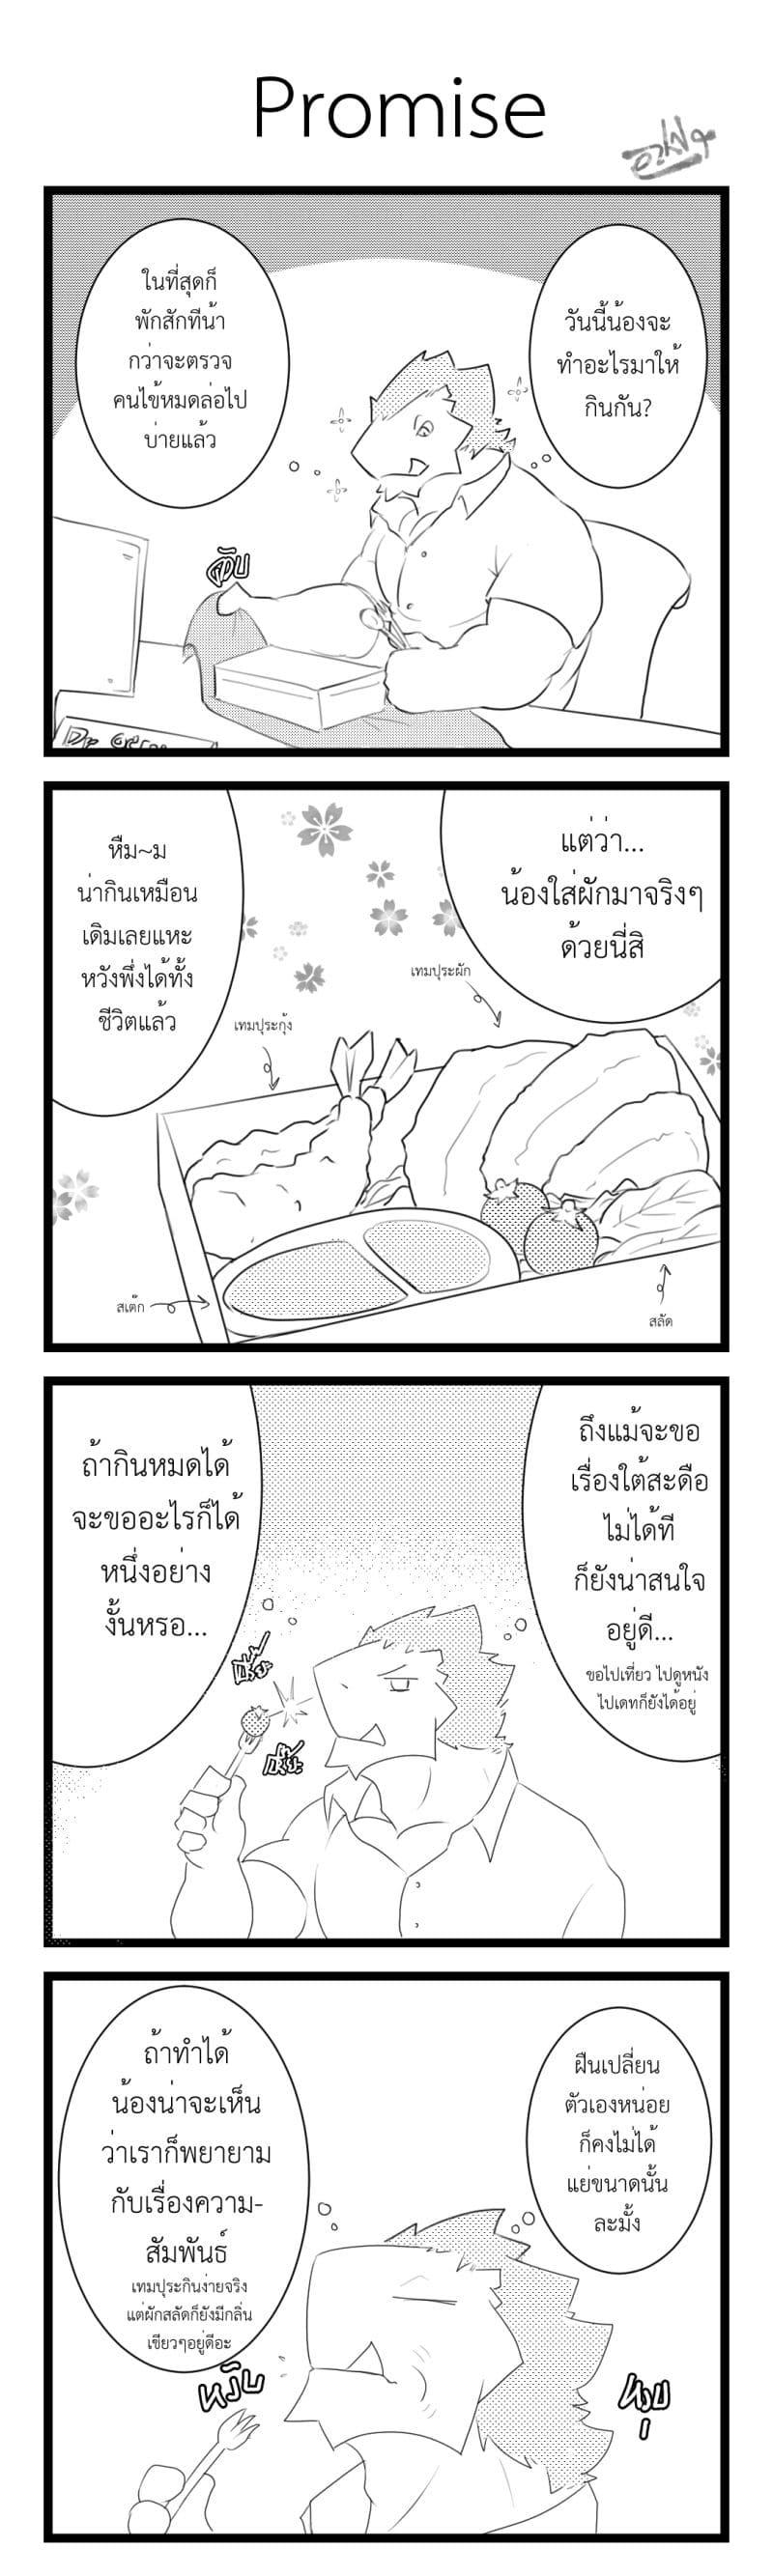 294 - Promise